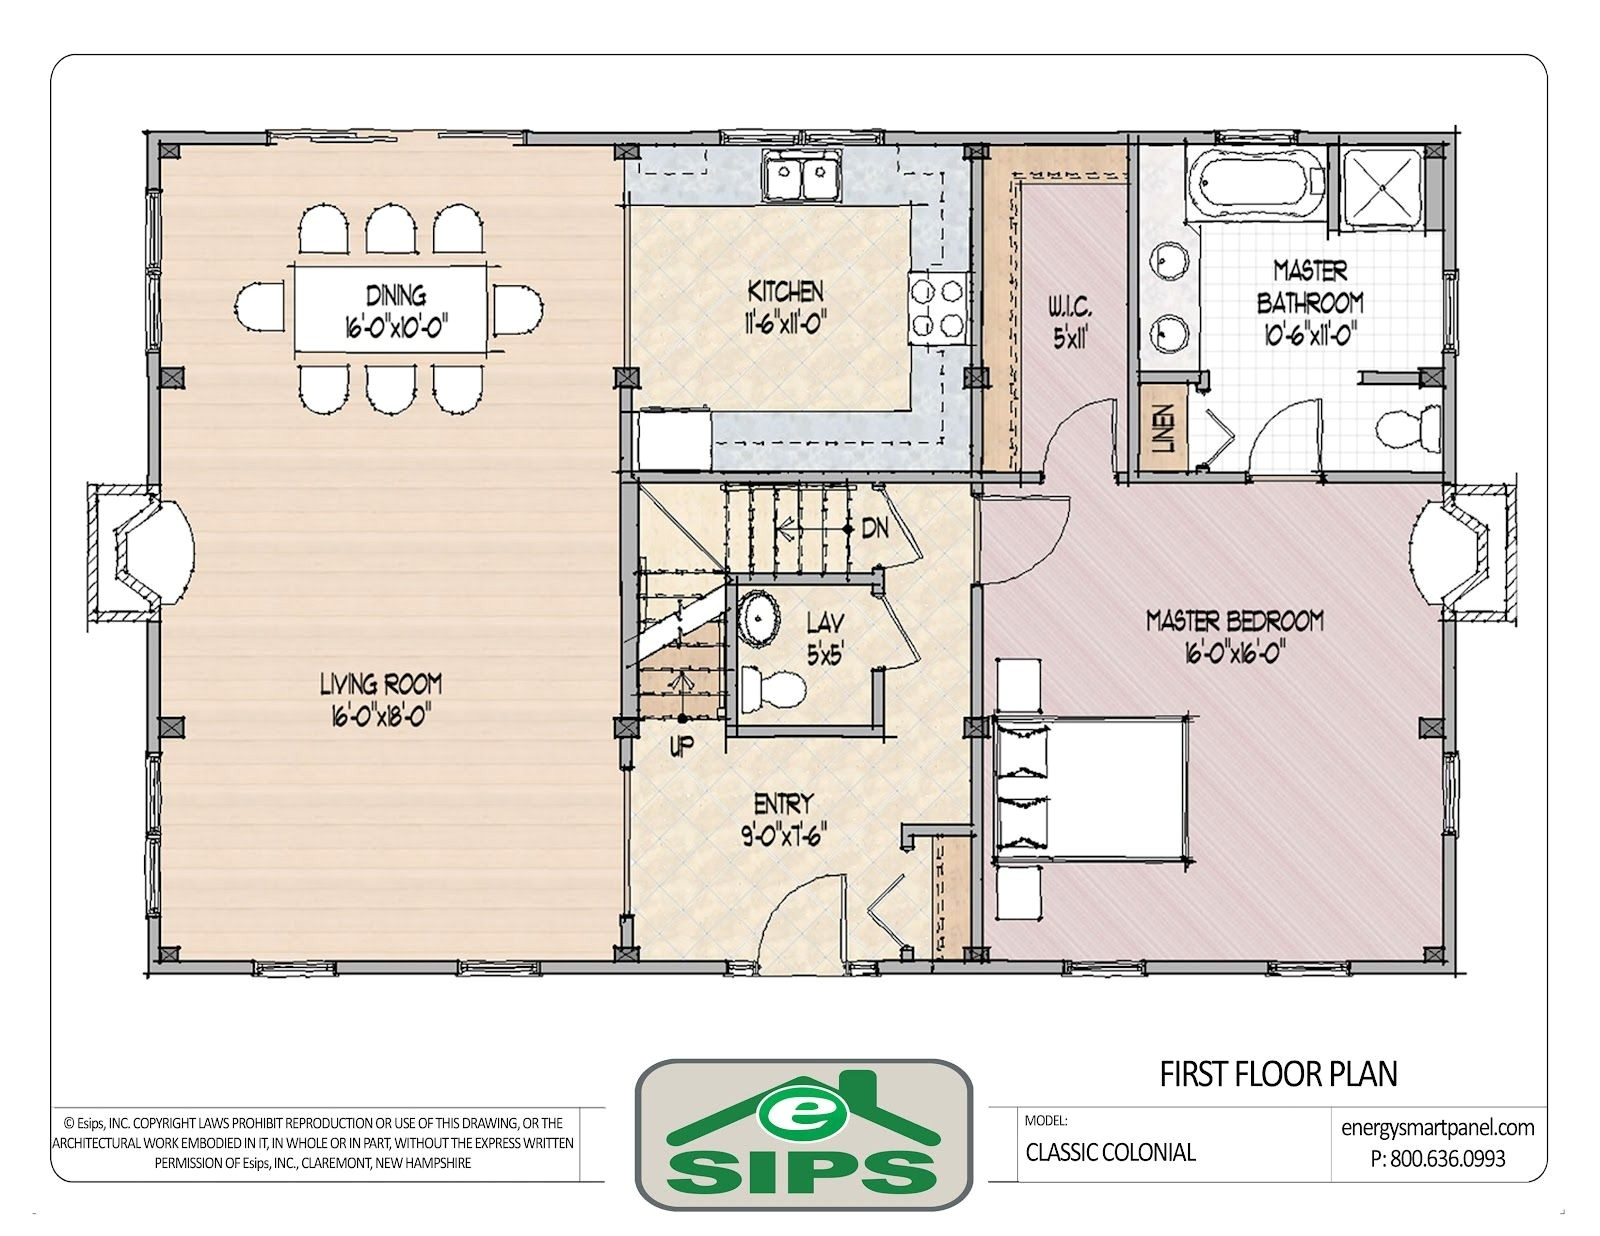 Home Open Floor Plans Open Floor Plan Colonial Homes House Plans Pinterest